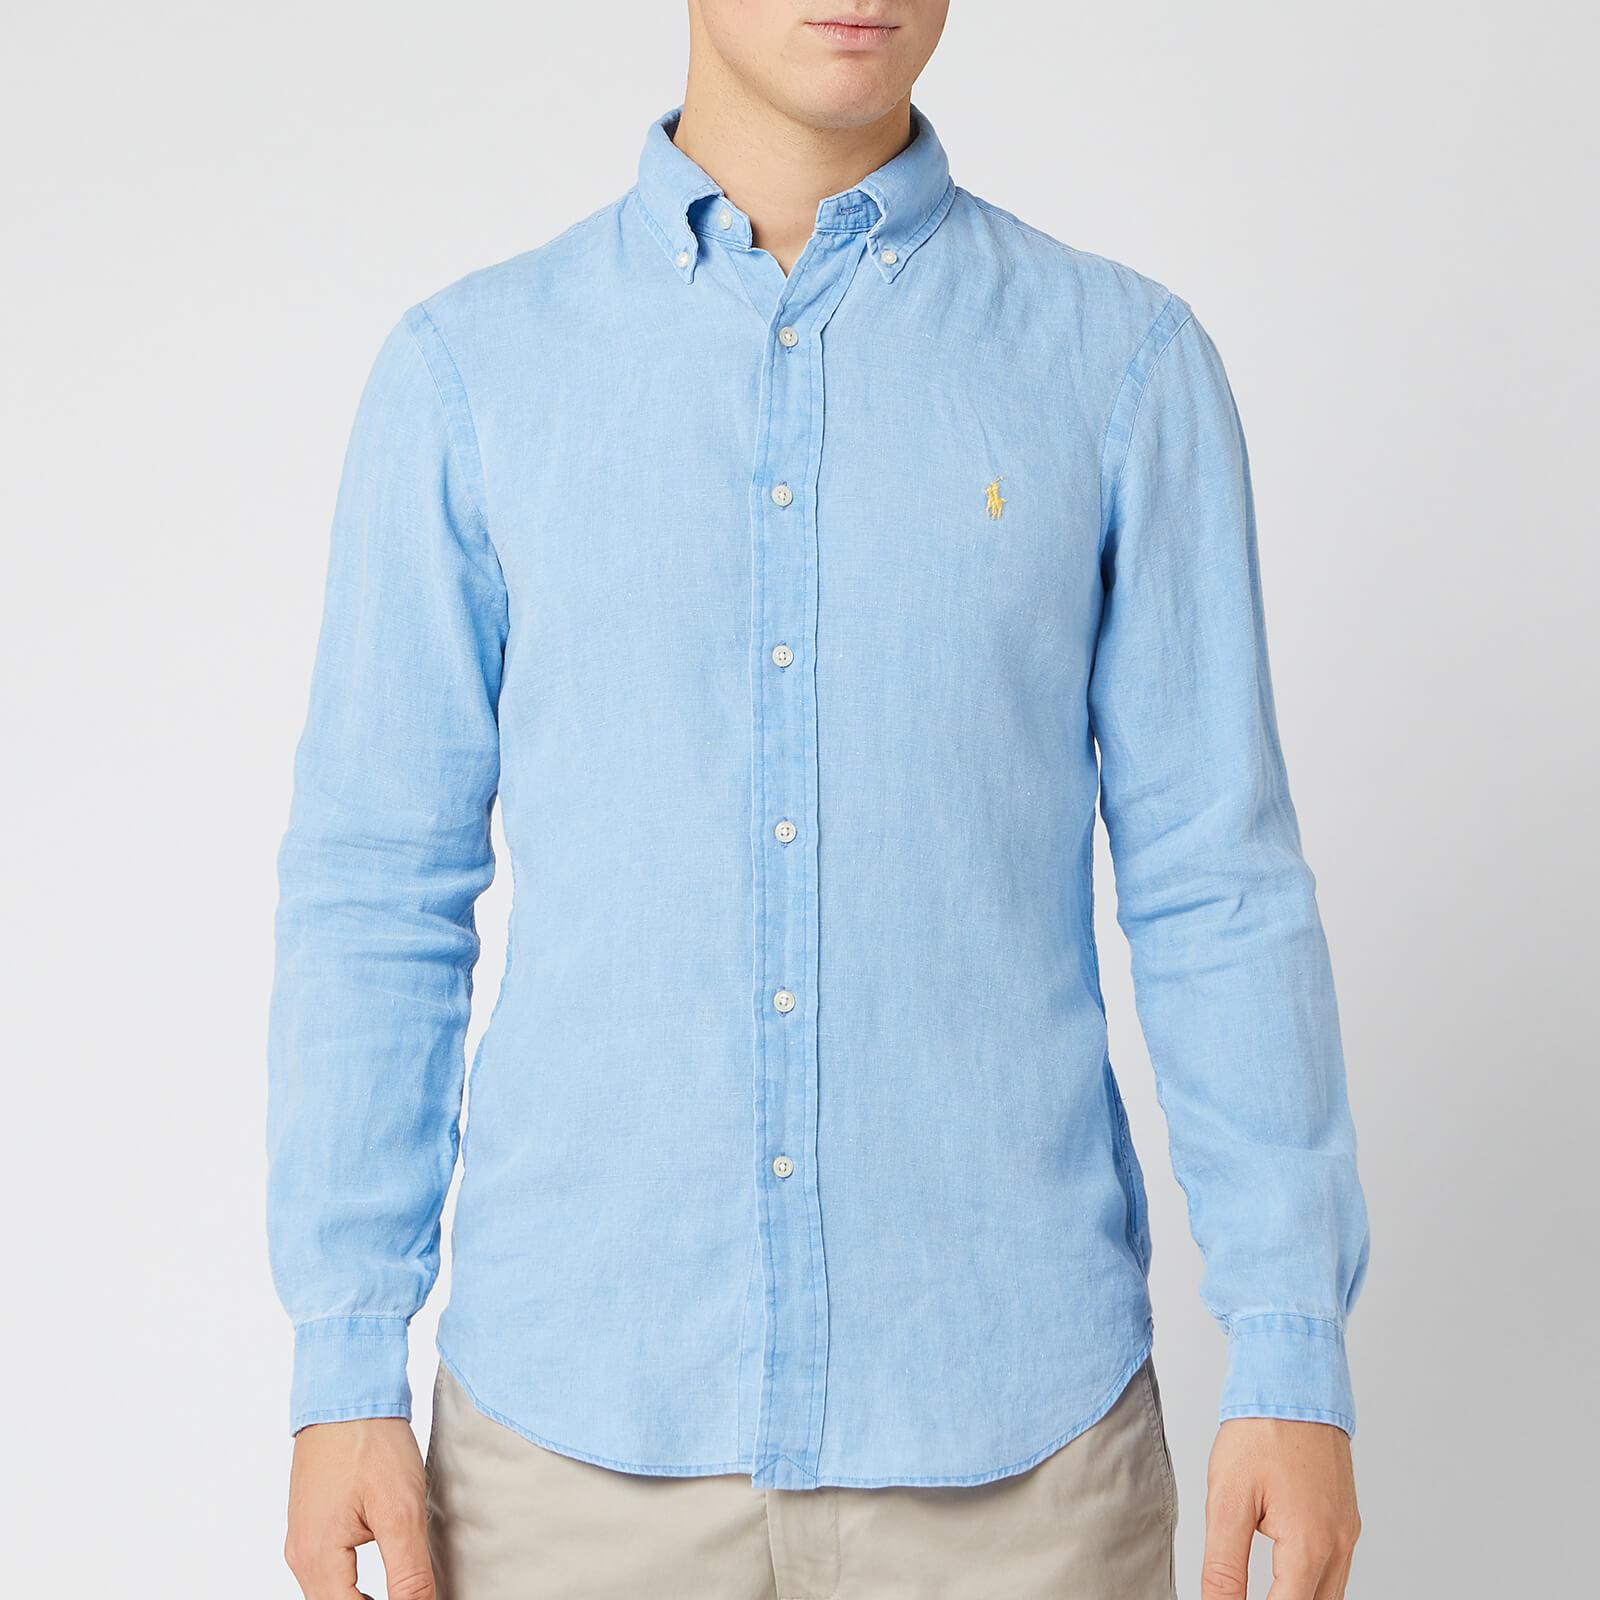 ed80eabfe4 Polo Ralph Lauren Men's Slim Fit Linen Shirt - Riviera Blue